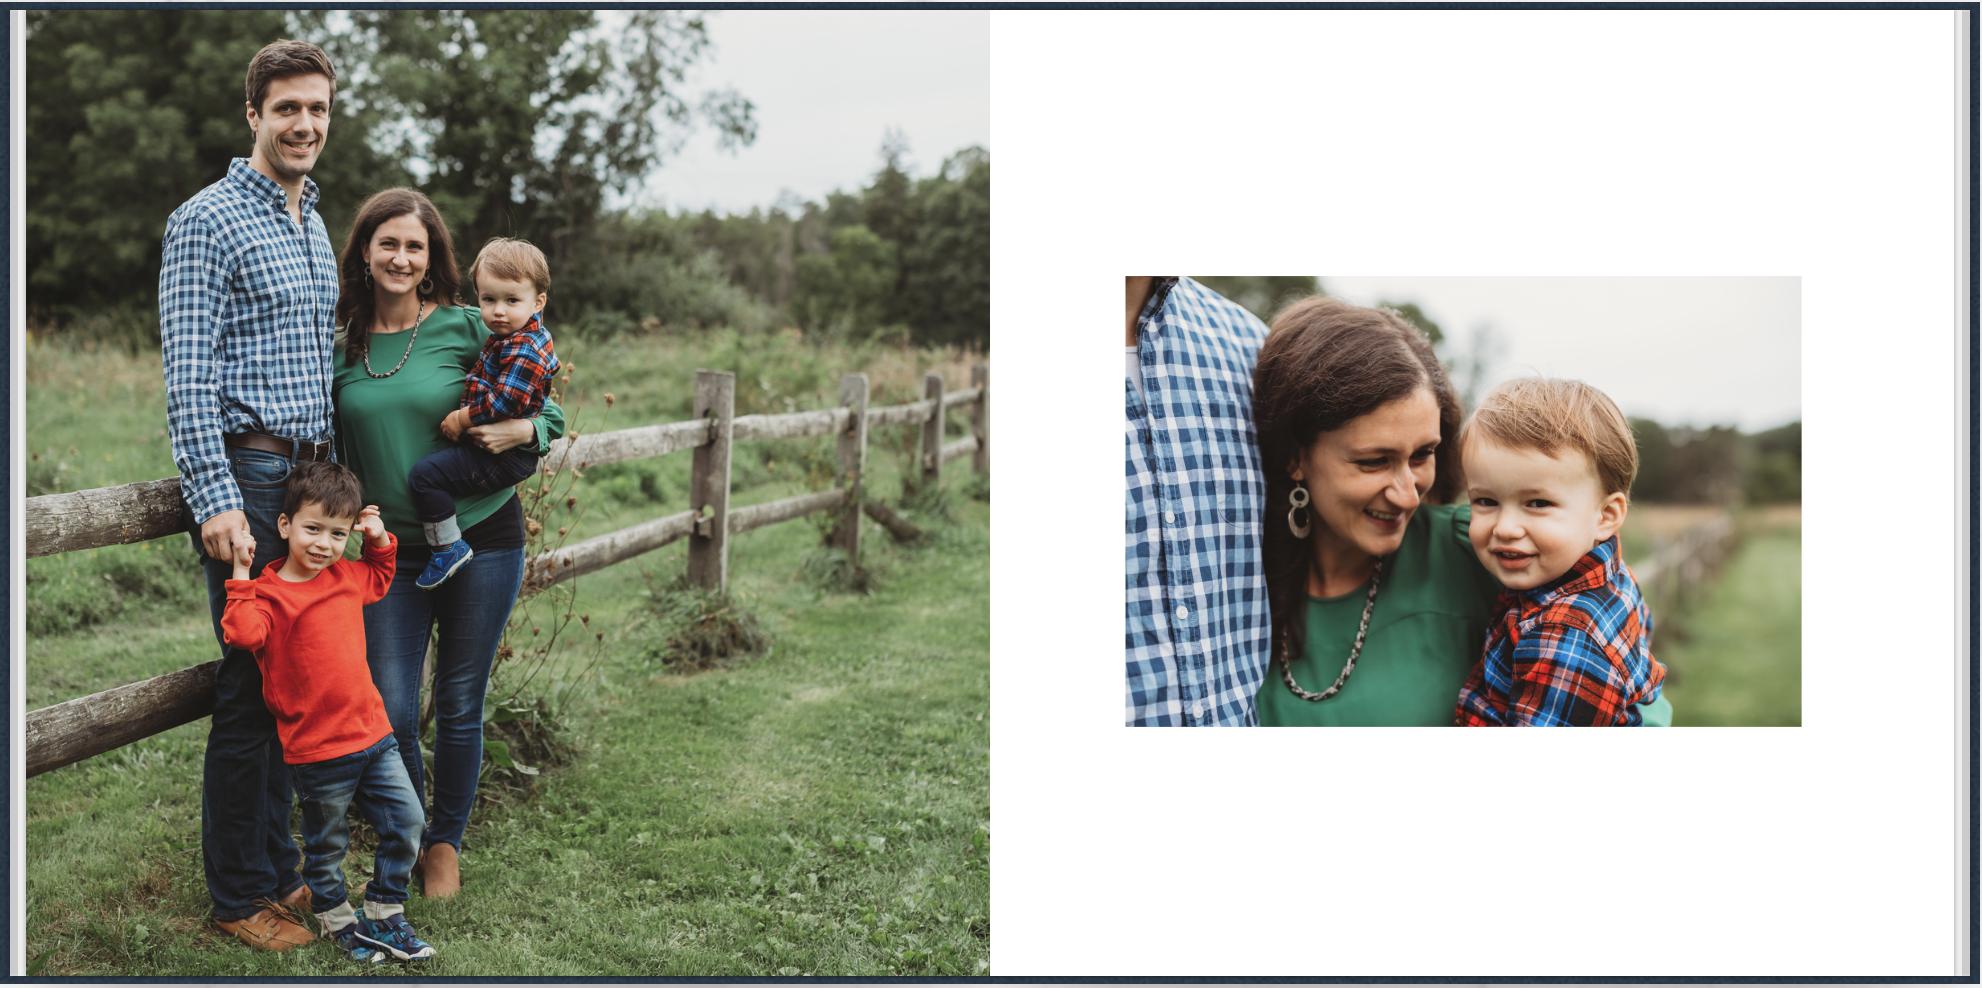 joy-leduc-boston-family-photographer-order-albums.jpg